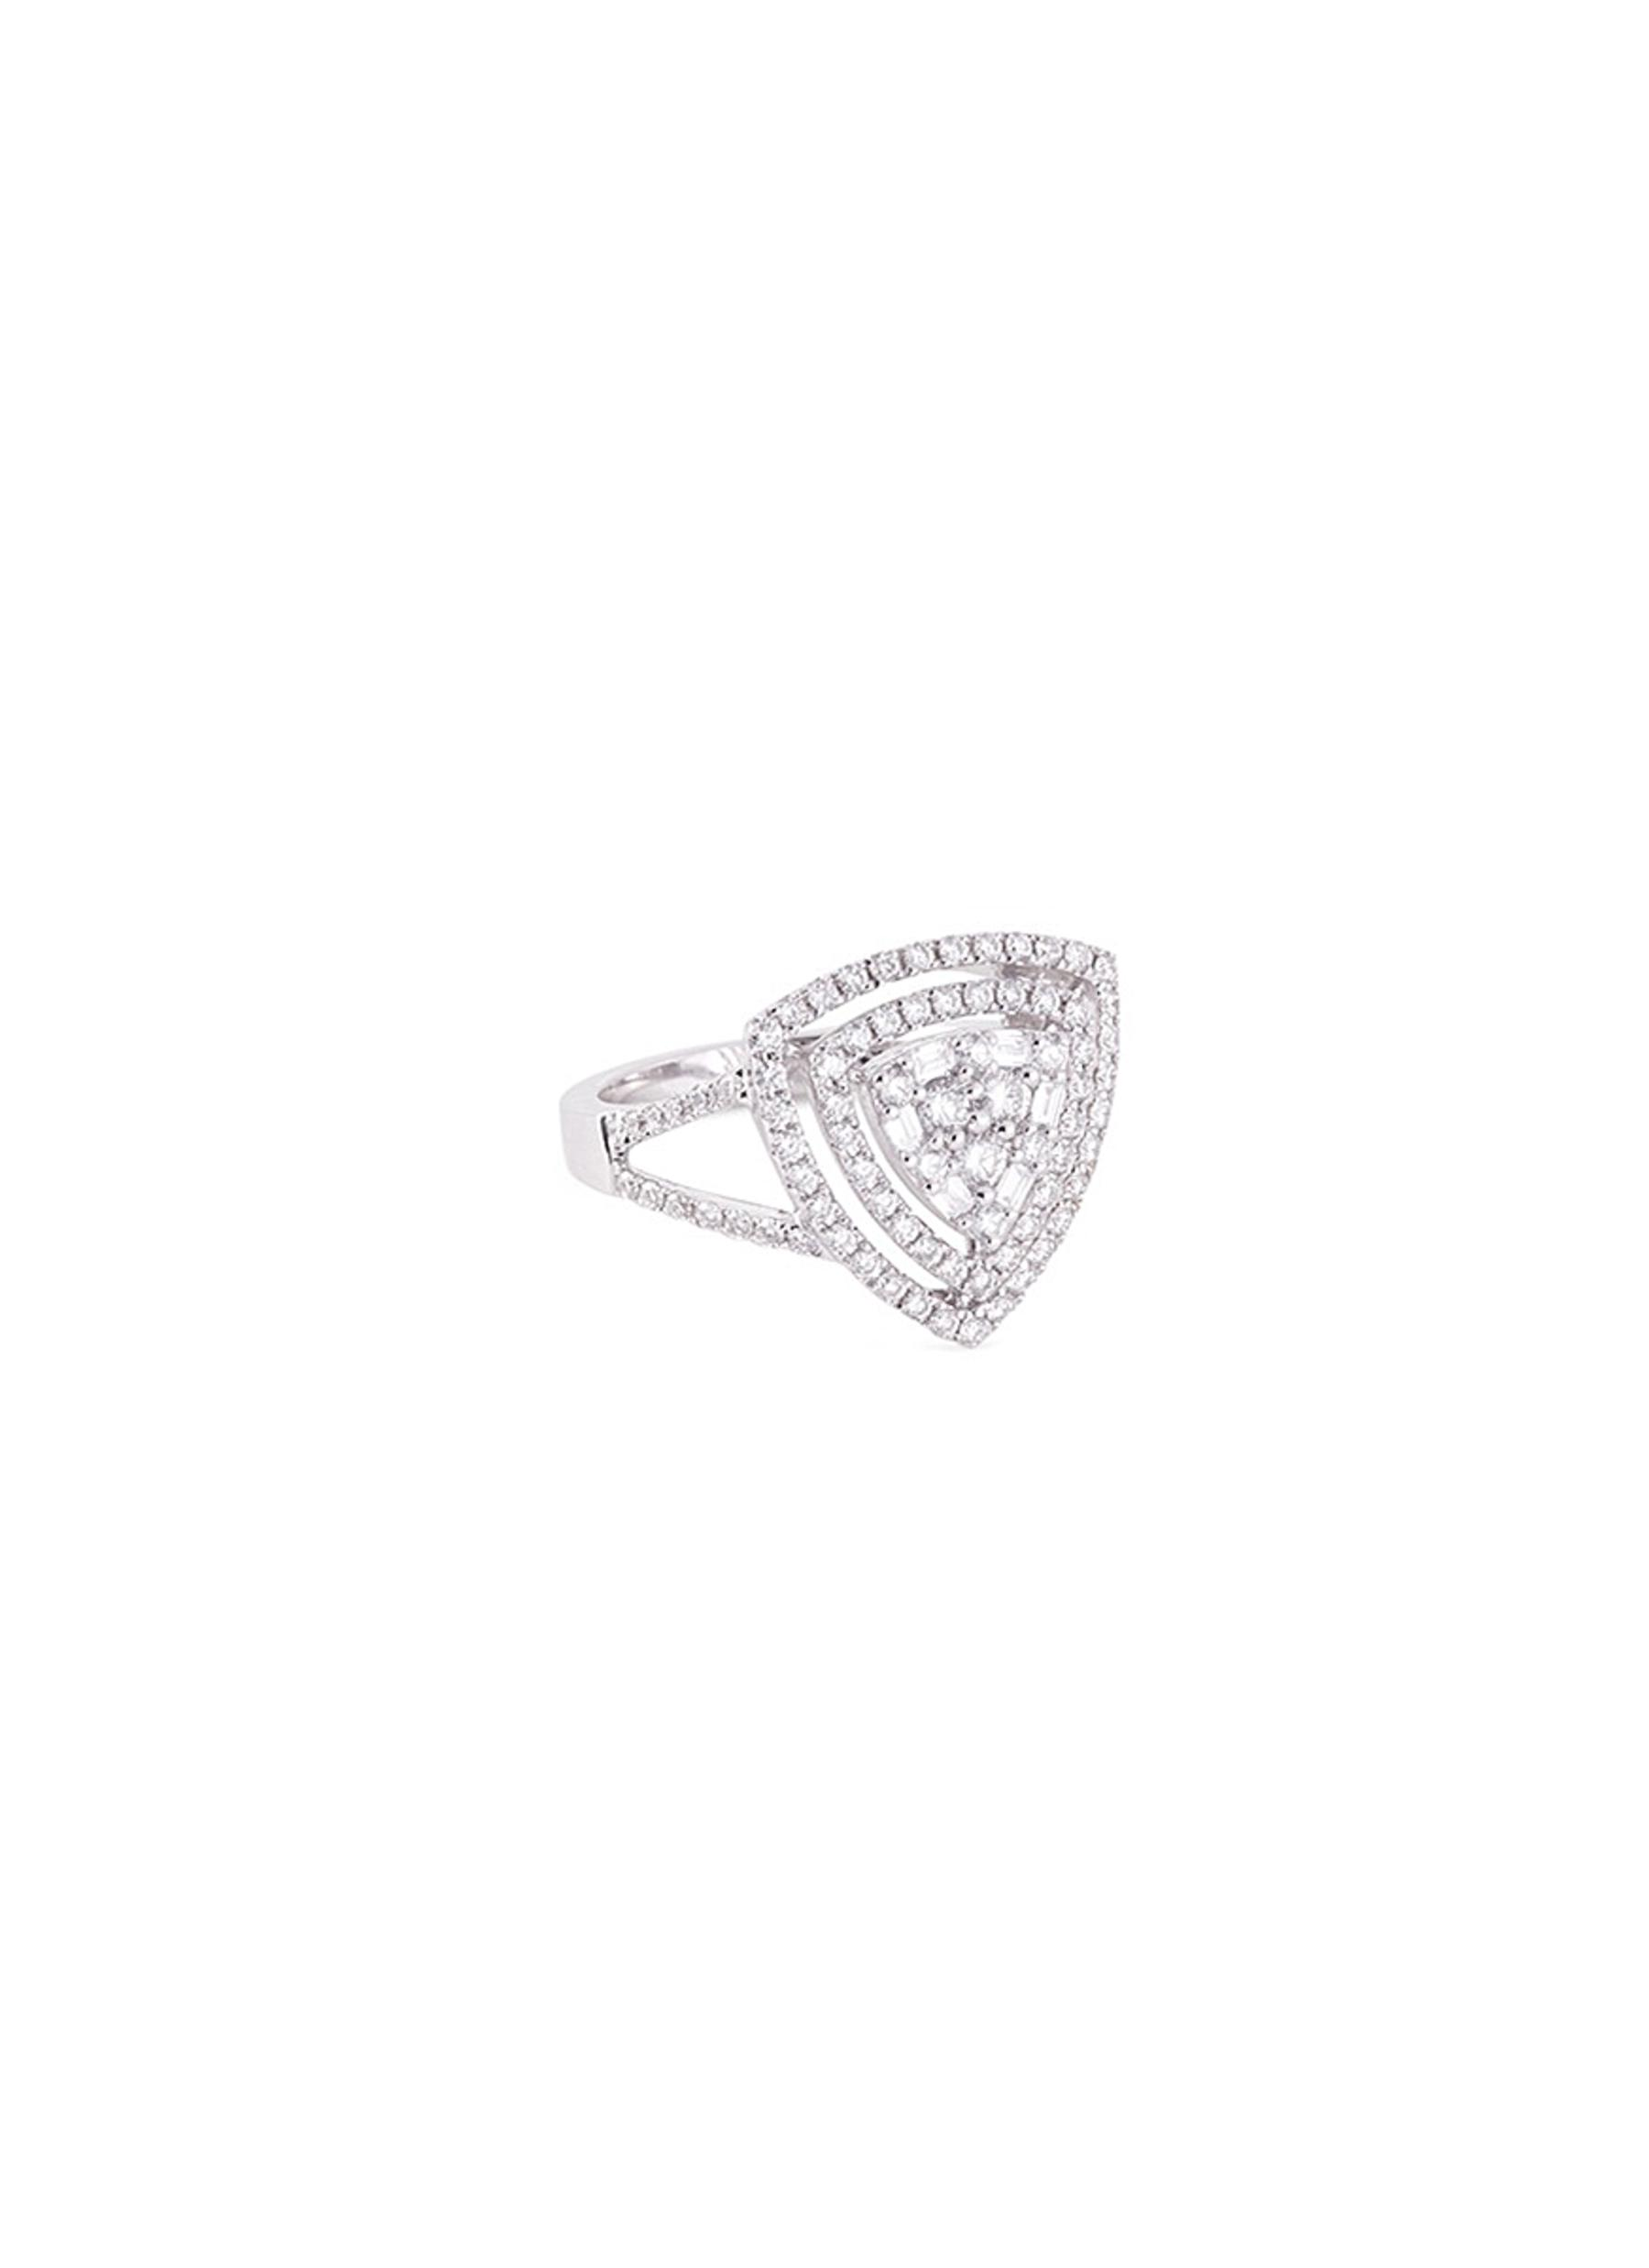 Diamond 18k gold triangle cutout ring